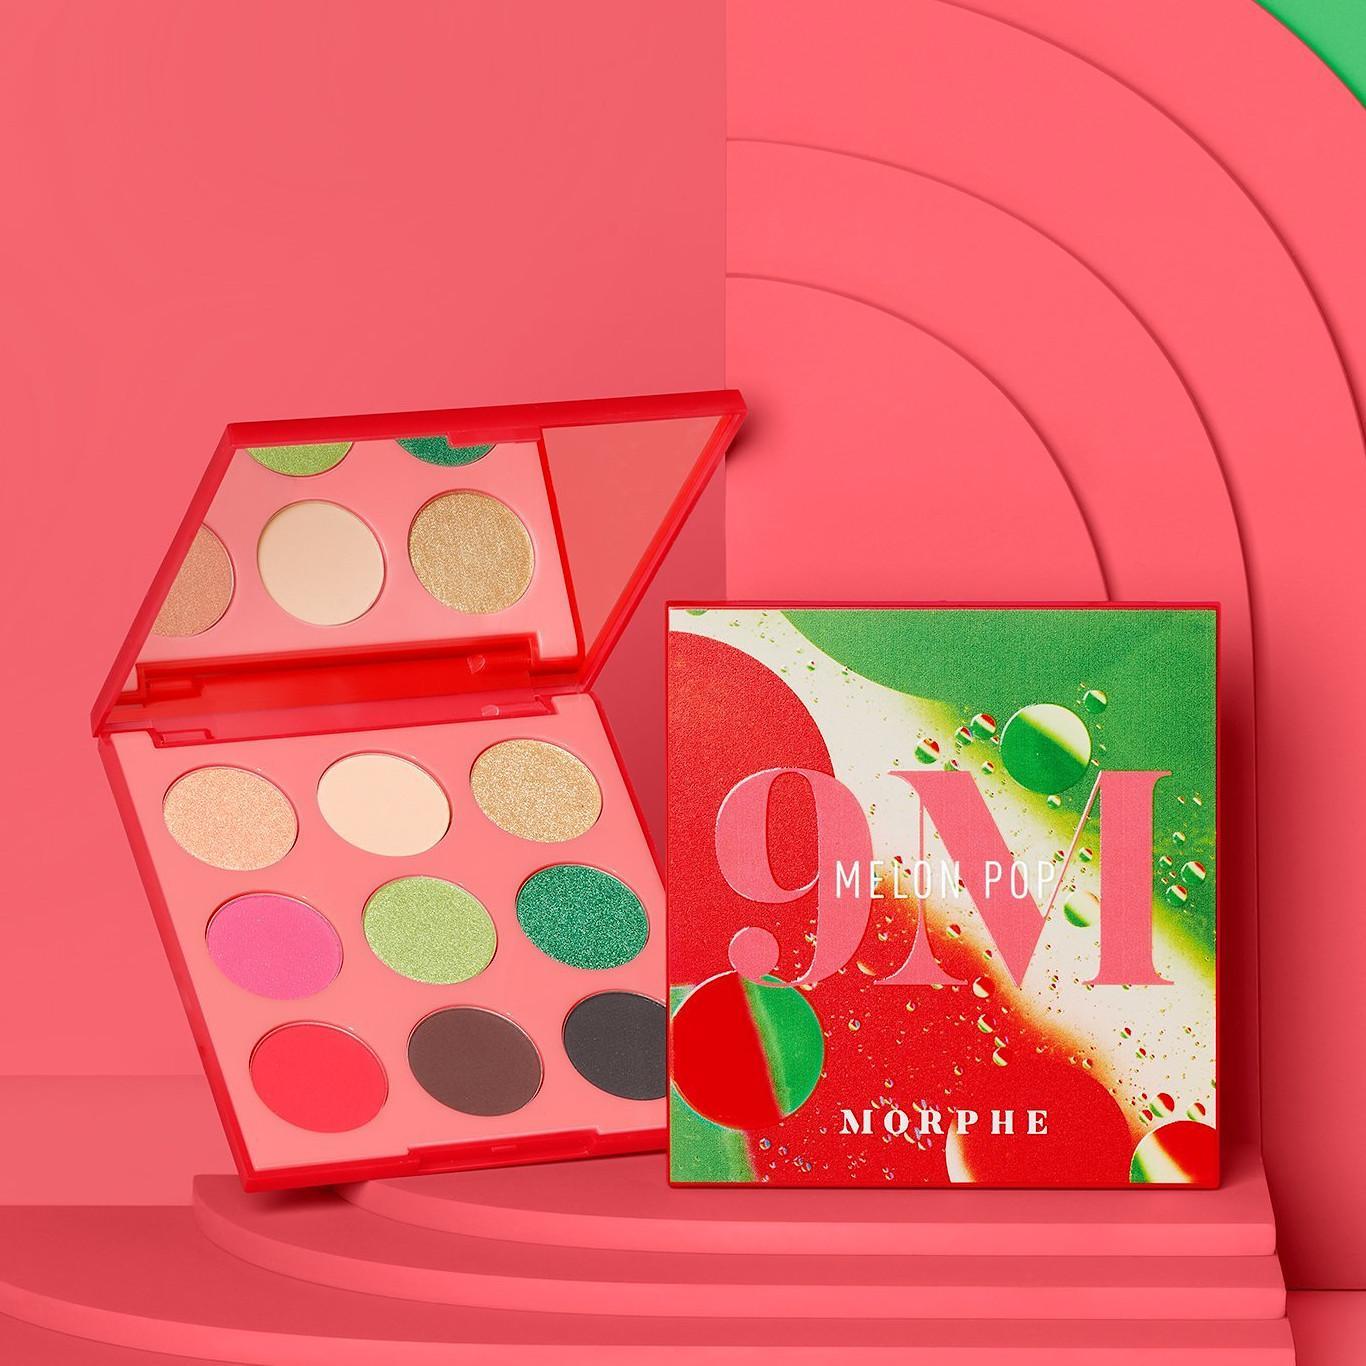 Moprhe 9M Melon Pop Artistry Palette Promo